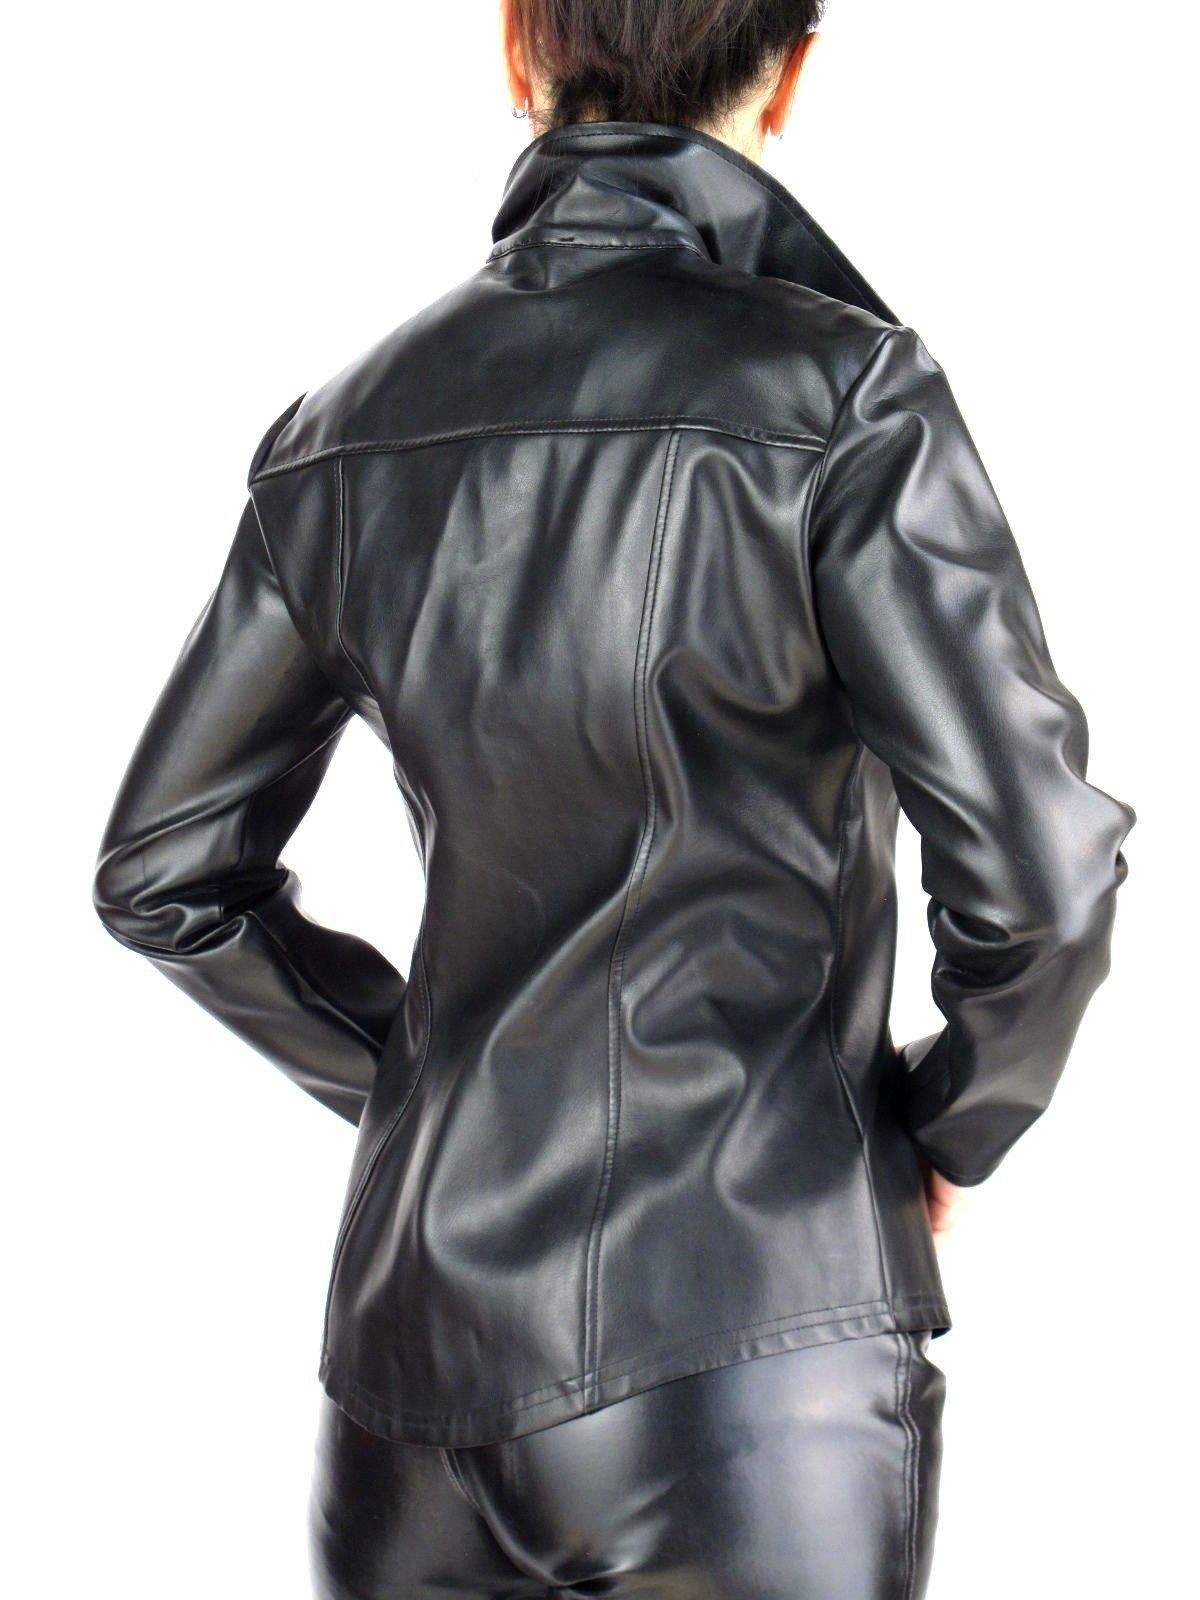 BLACK PVC LEATHER DRESS SHIRT - VINYL RUBBERY from MORGAN | eBay